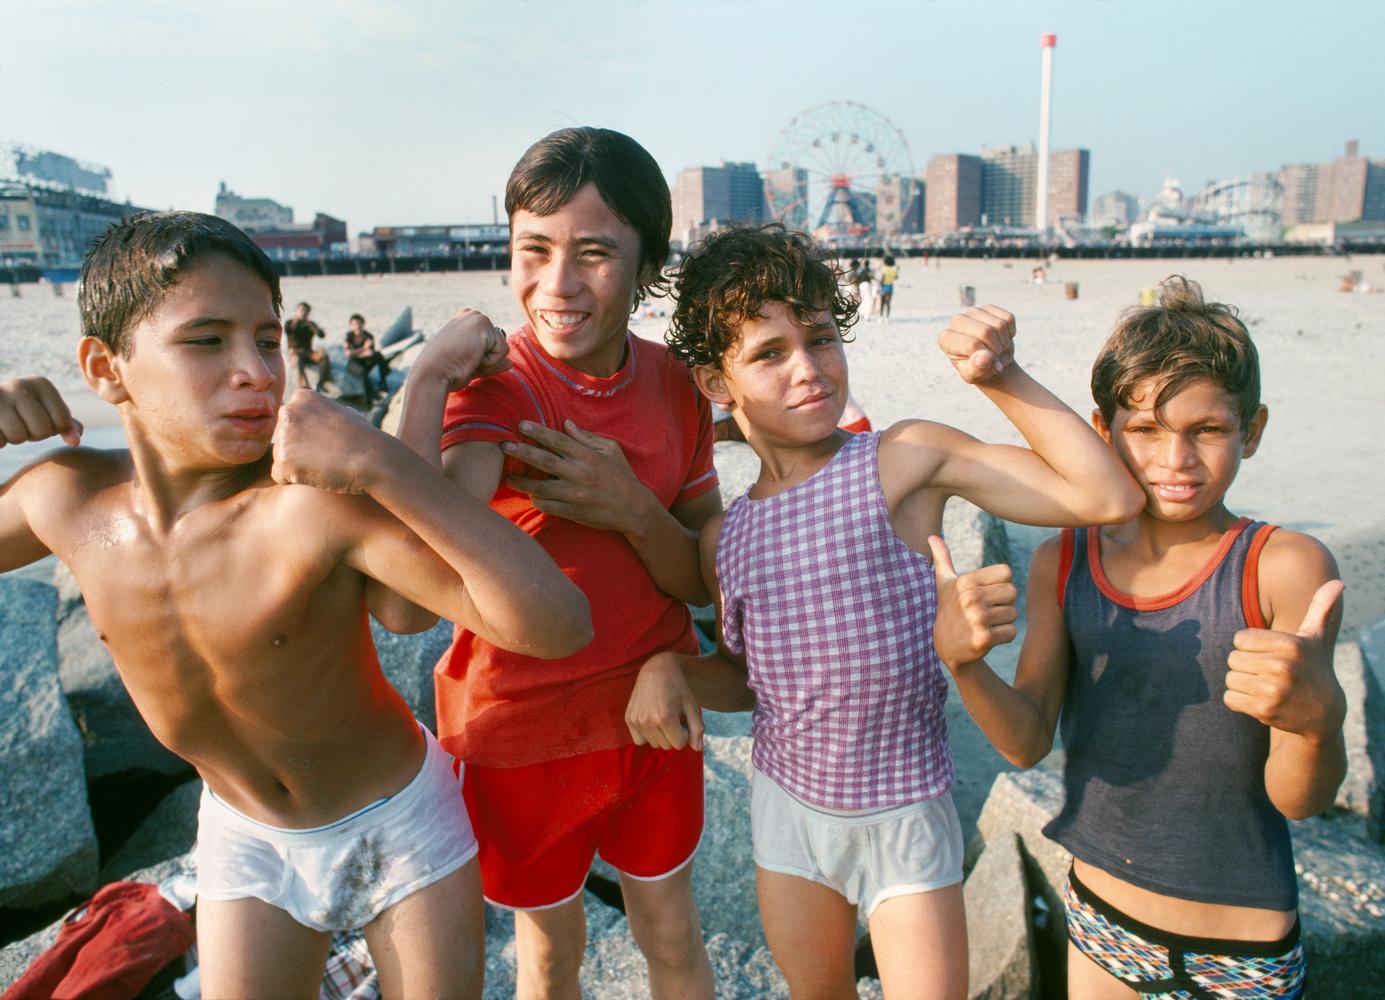 Paul Hosefros kids at the beach